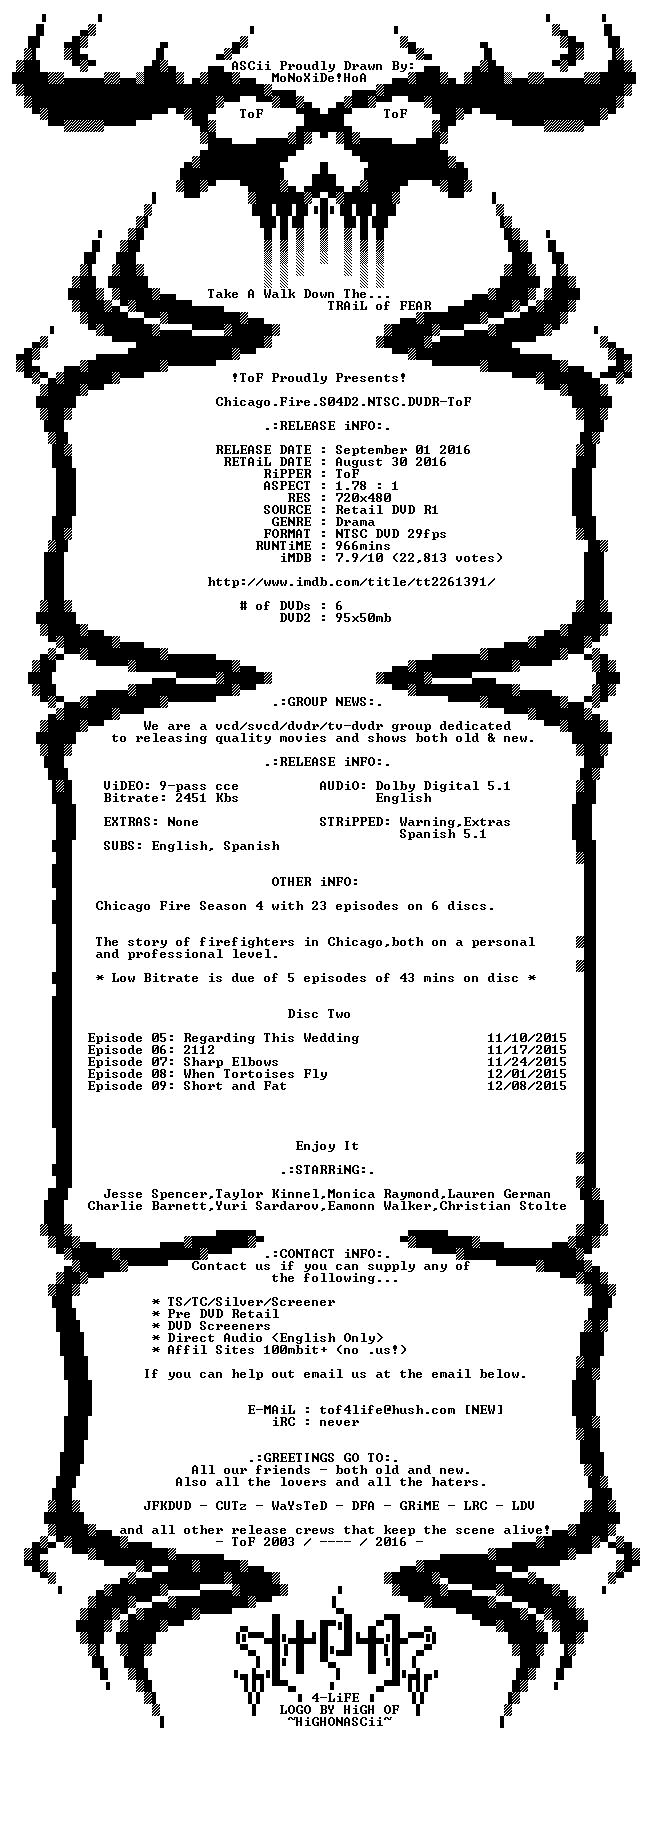 Chicago Fire S04 NTSC DVDR